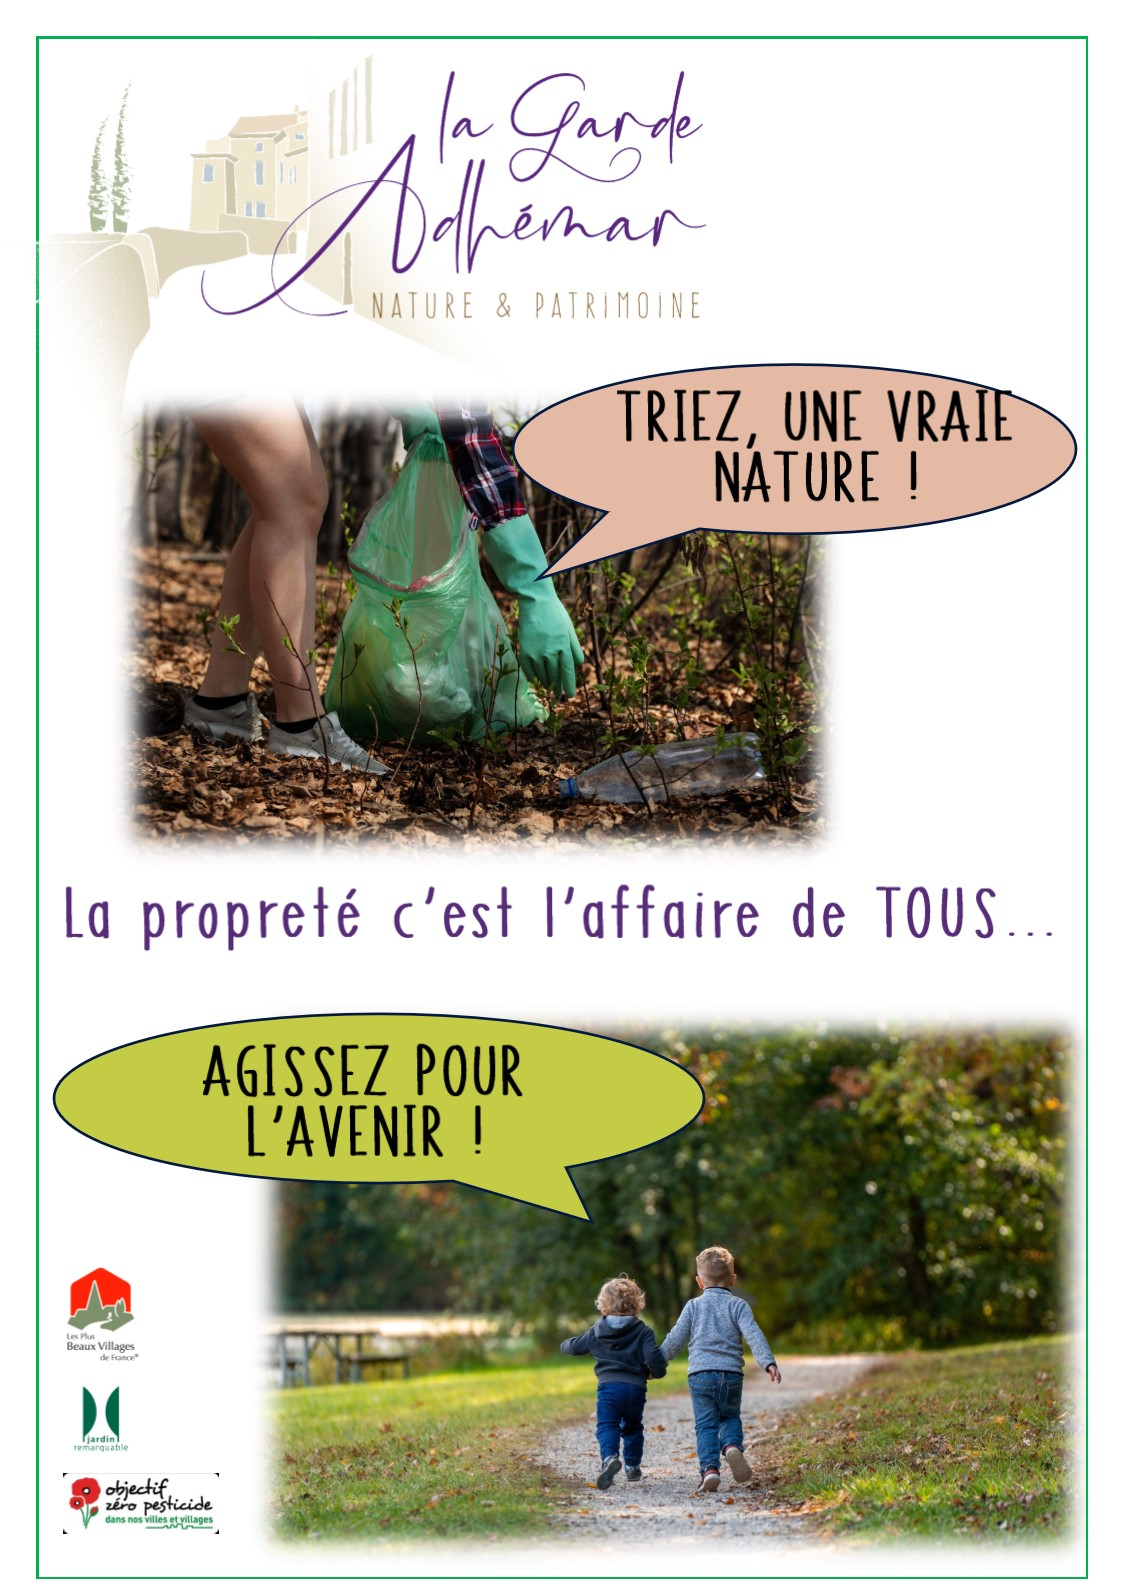 LGA - Affiche Campagne VILLAGE PROPRE - 2021 TRIER DECHETS - v4_1.jpg